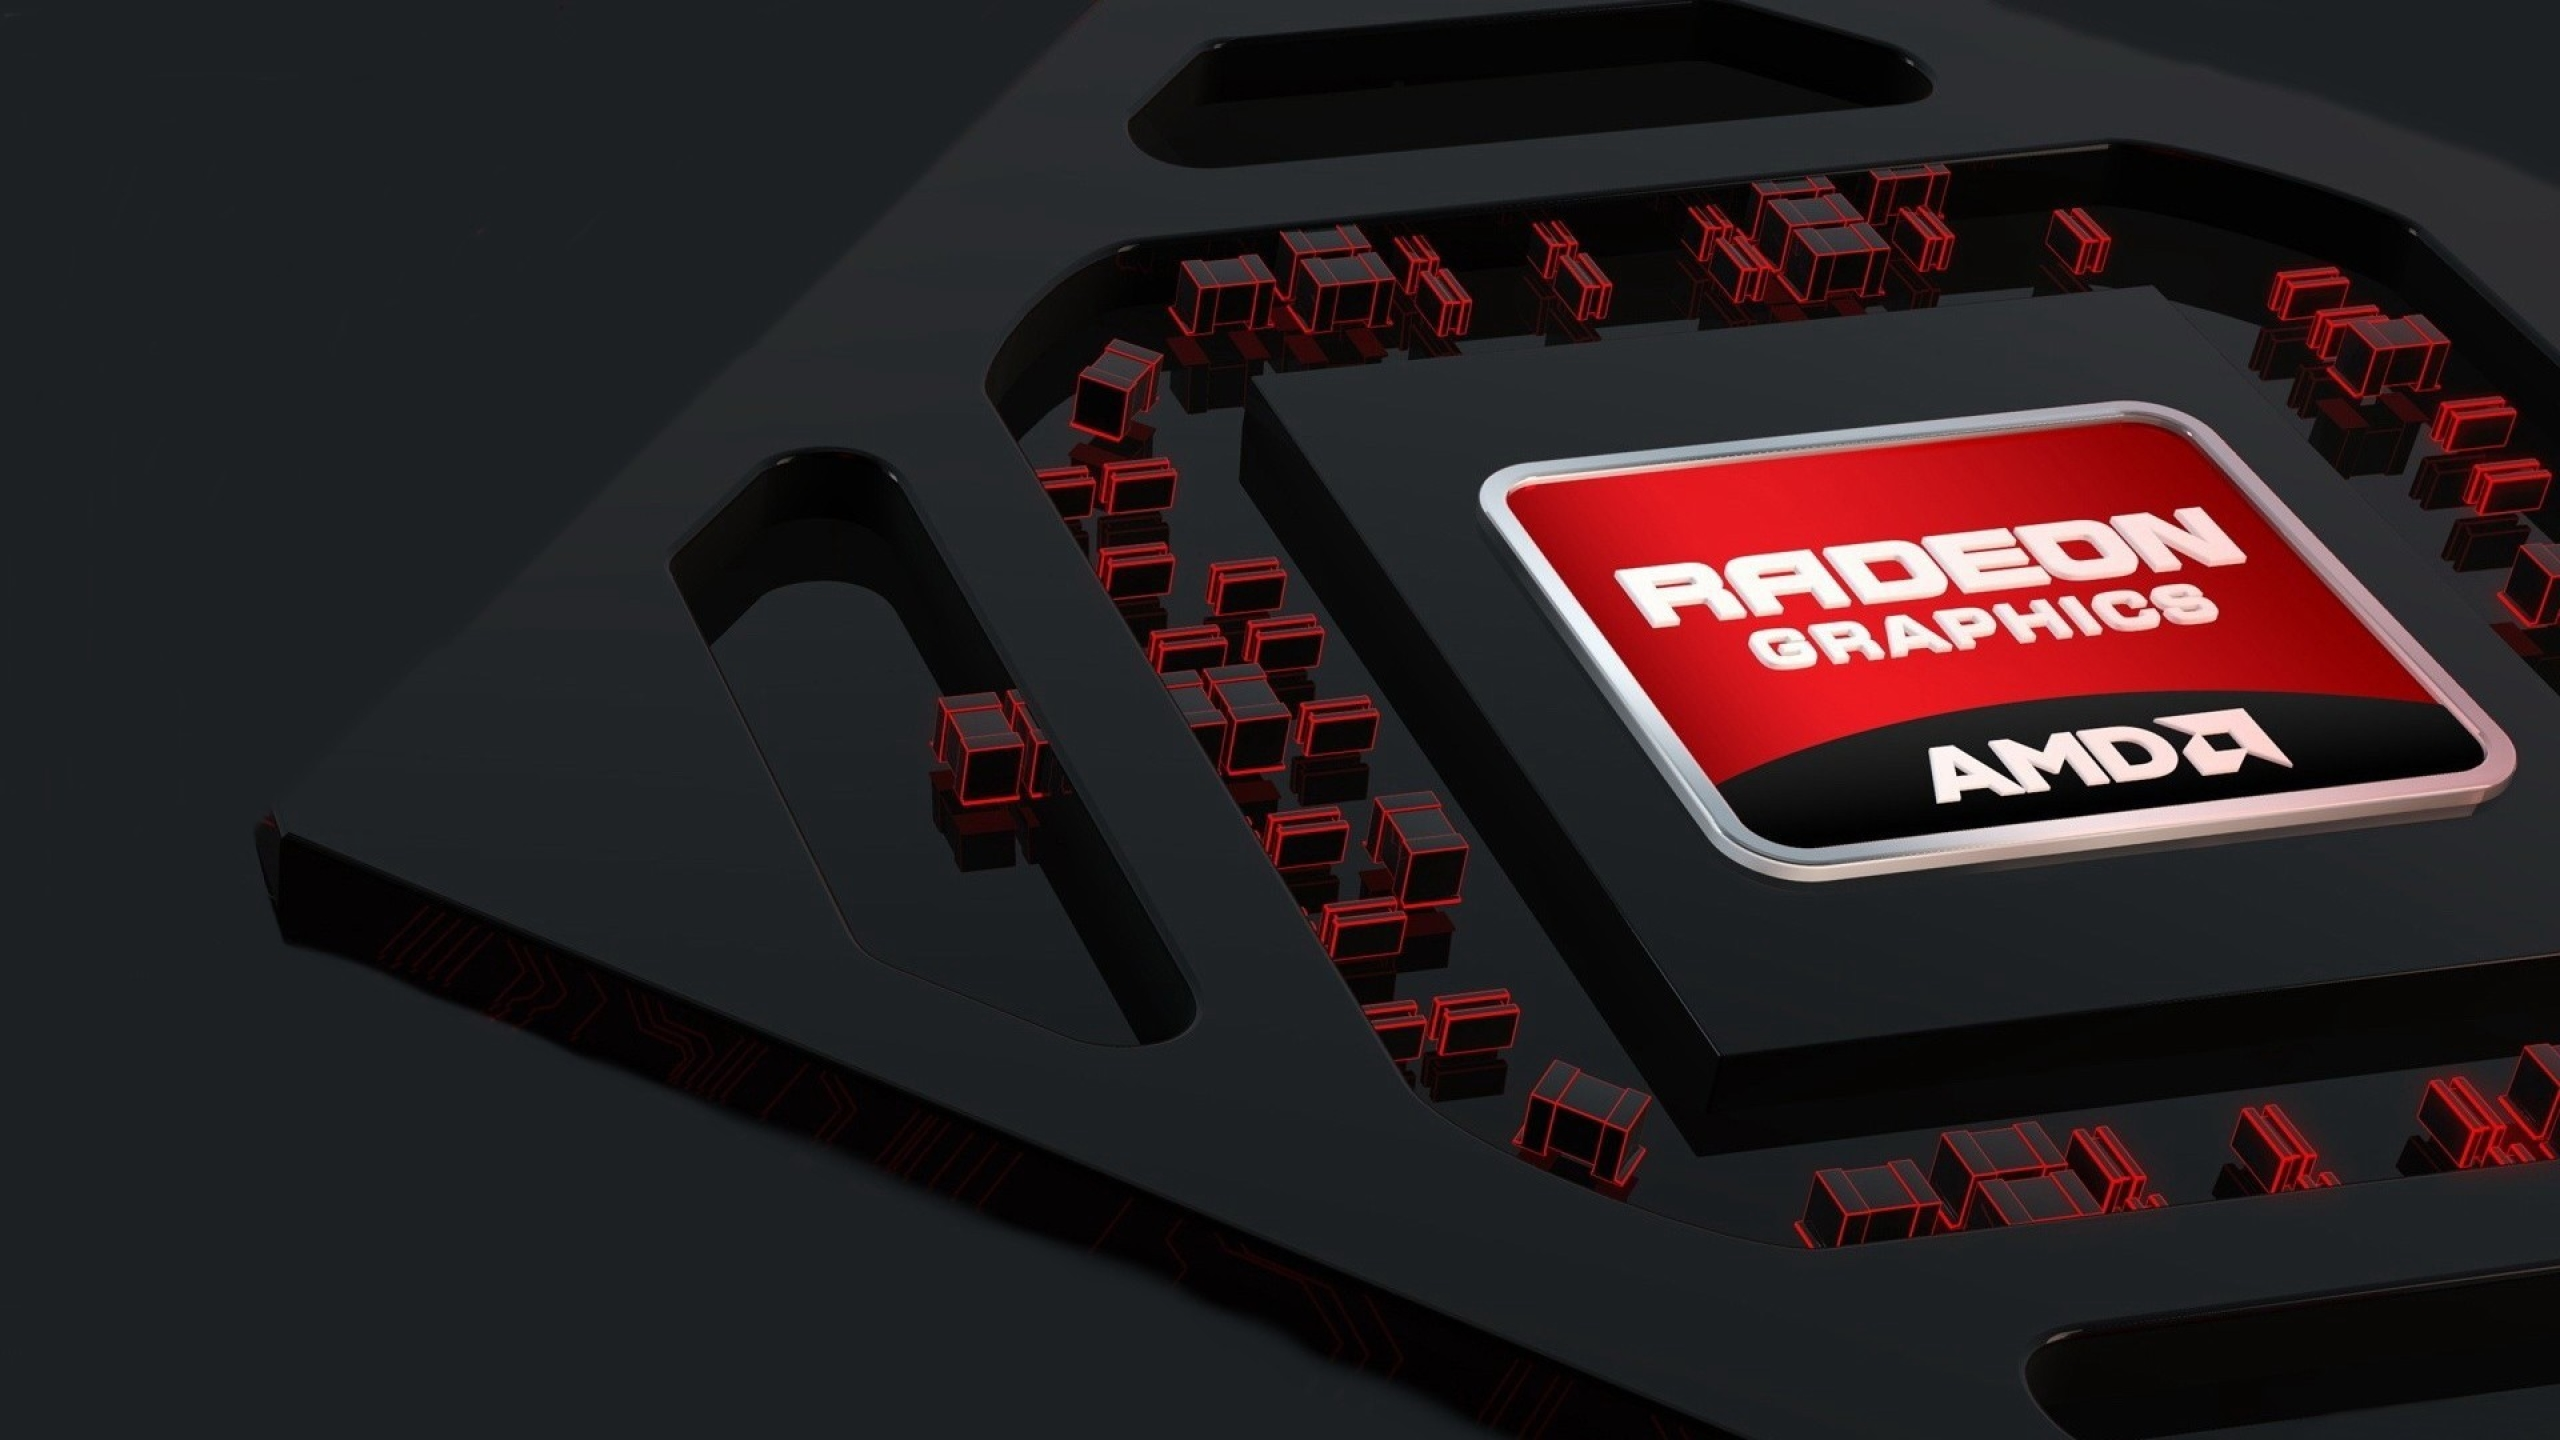 2560x1440 Gpu Amd Radeon 1440p Resolution Wallpaper Hd Hi Tech 4k Wallpapers Images Photos And Background